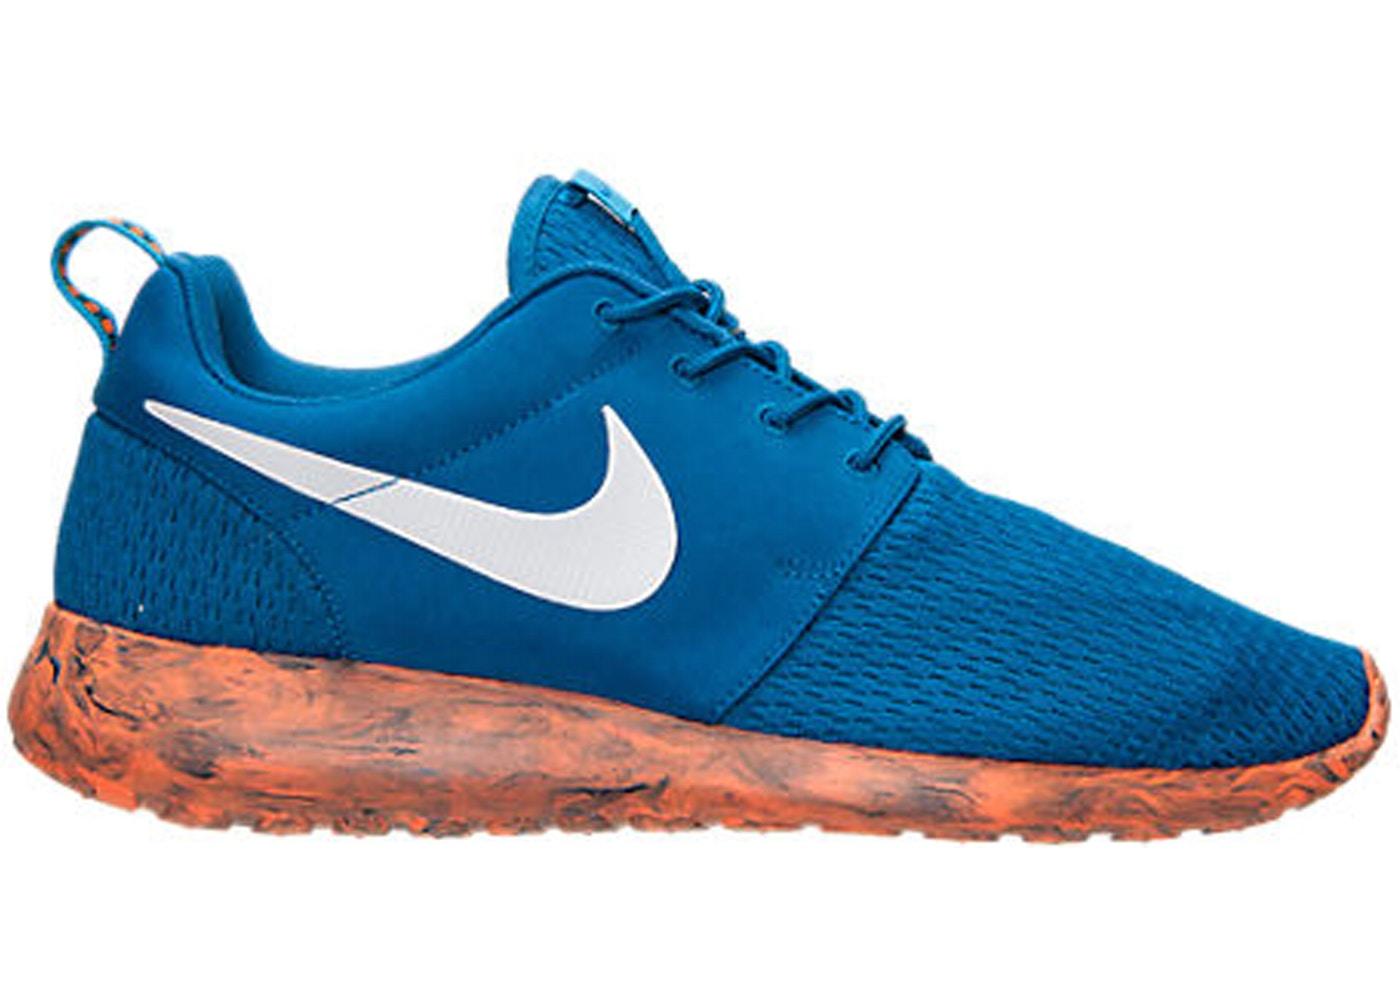 Hacer las tareas domésticas Exclusivo mucho  Nike Roshe Run Marble Military Blue Orange - 669985-400